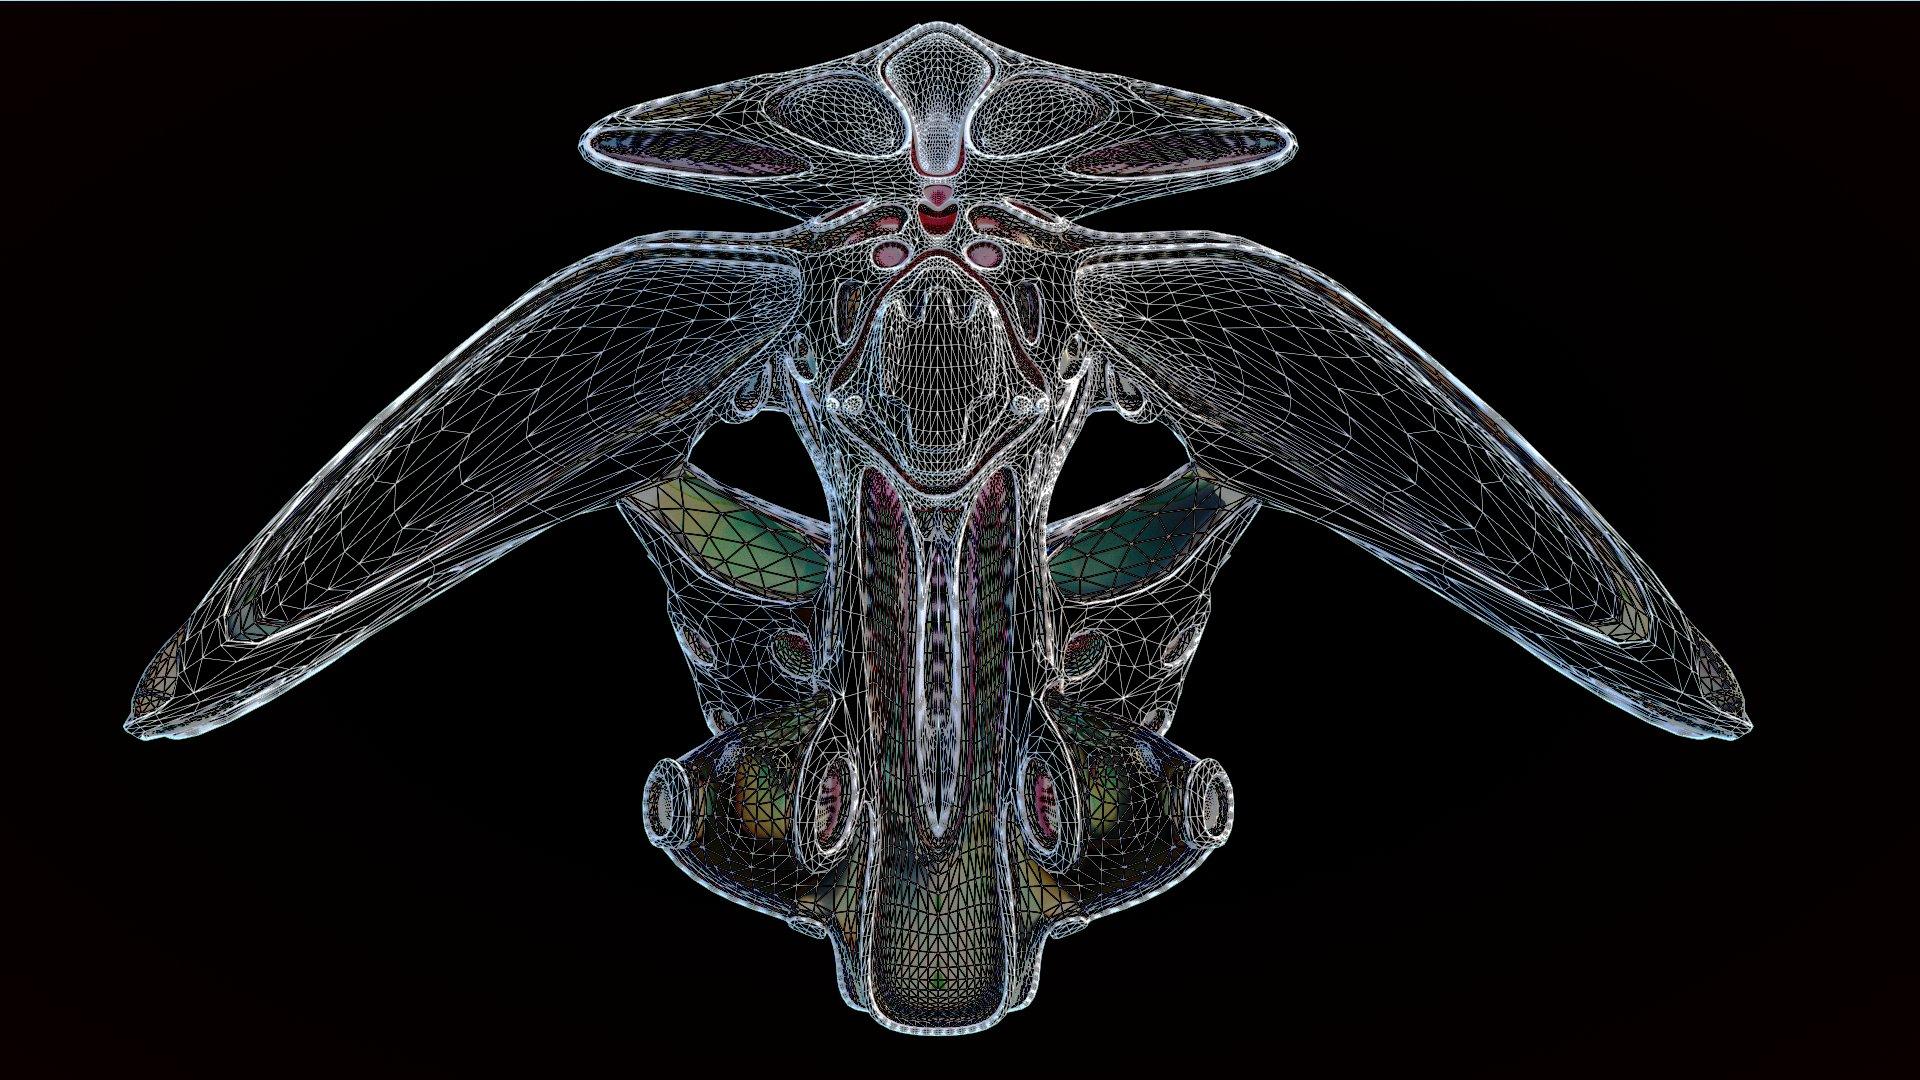 Kresimir jelusic btyfly 10